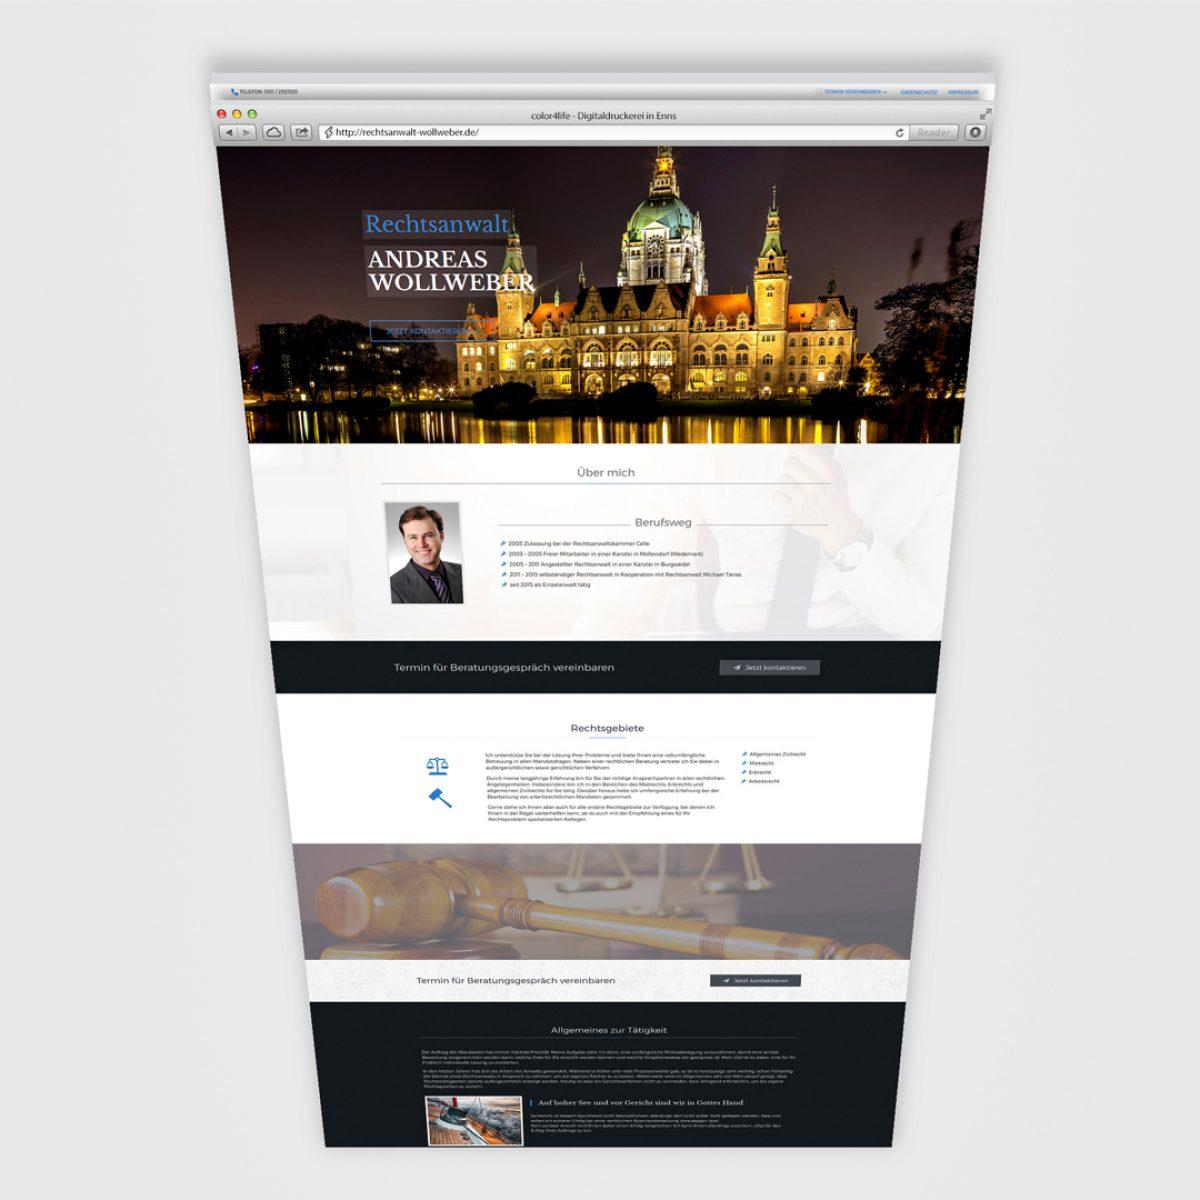 Webdesign Beispielprojekt Rechtsanwalt Andreas Wollweber